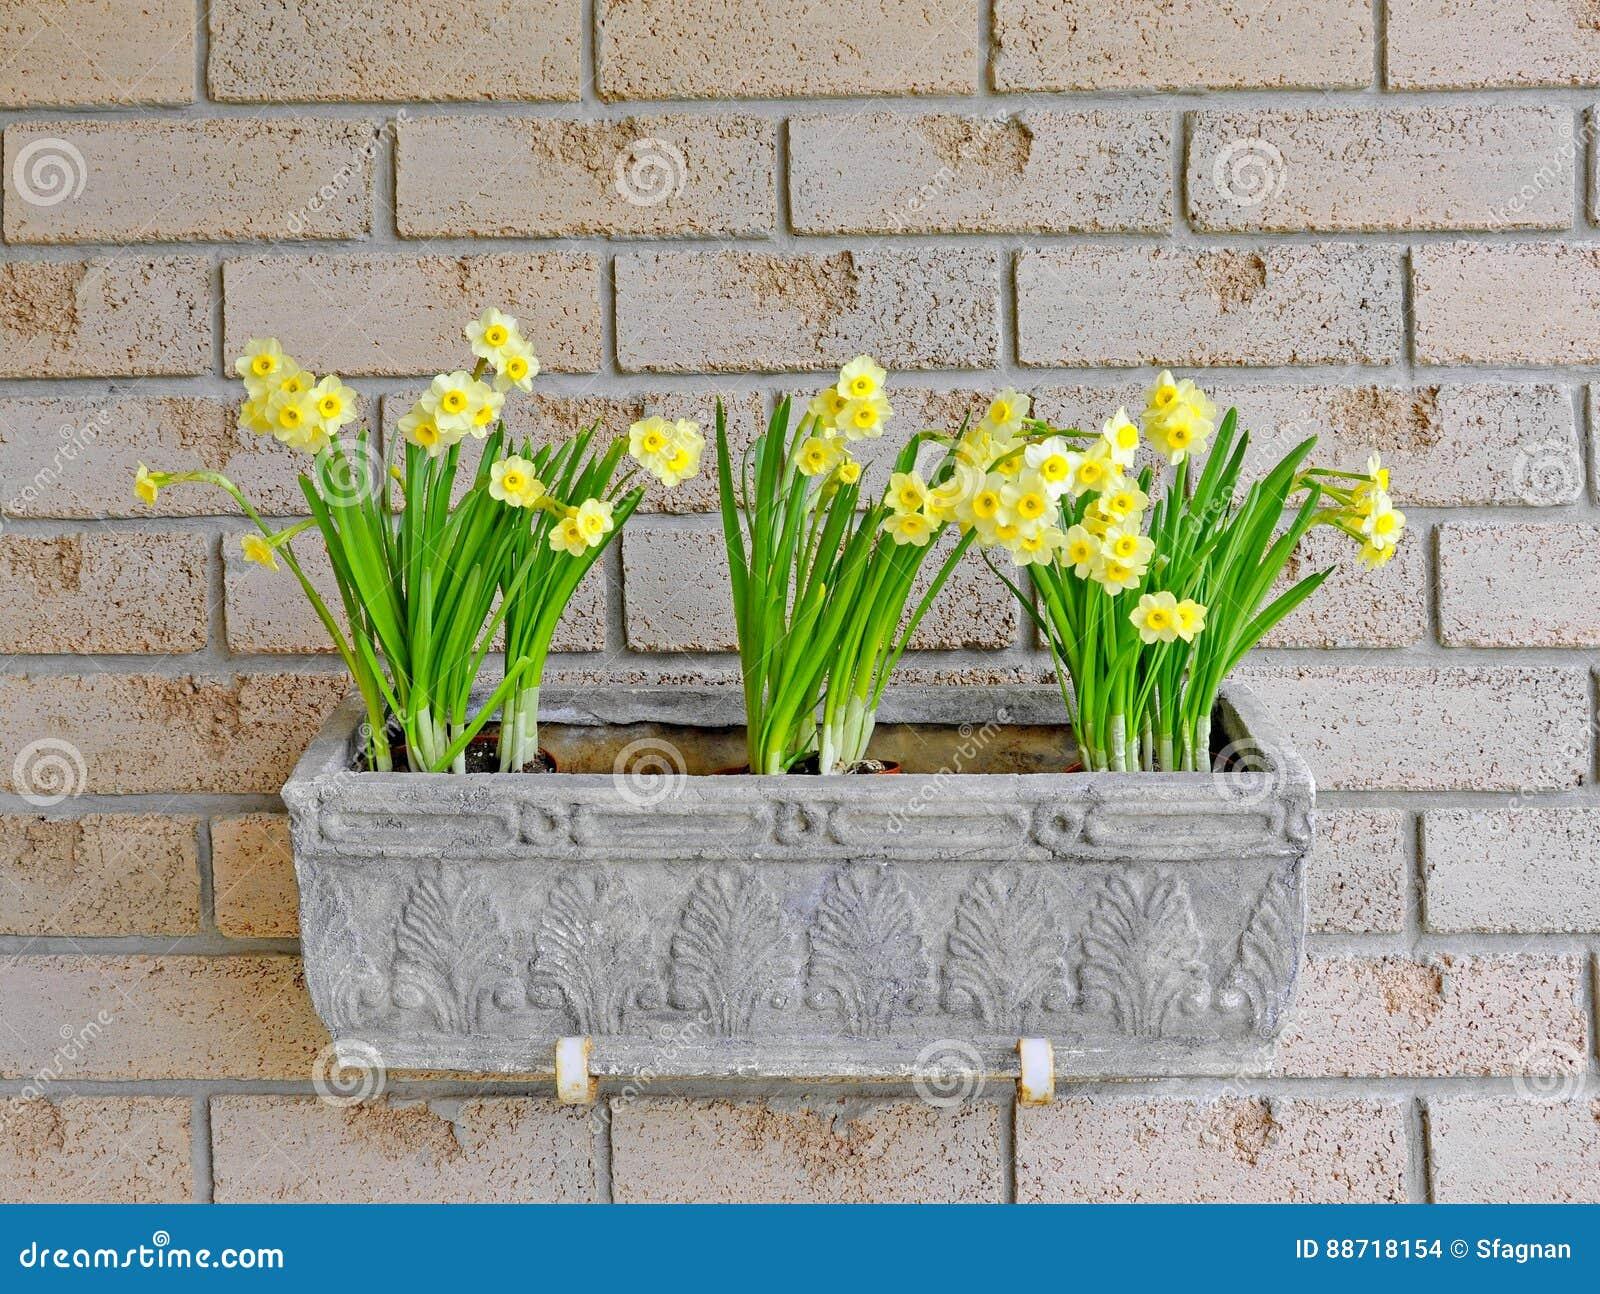 Daffodils In A Window Box Stock Photo Image Of Daffodils 88718154